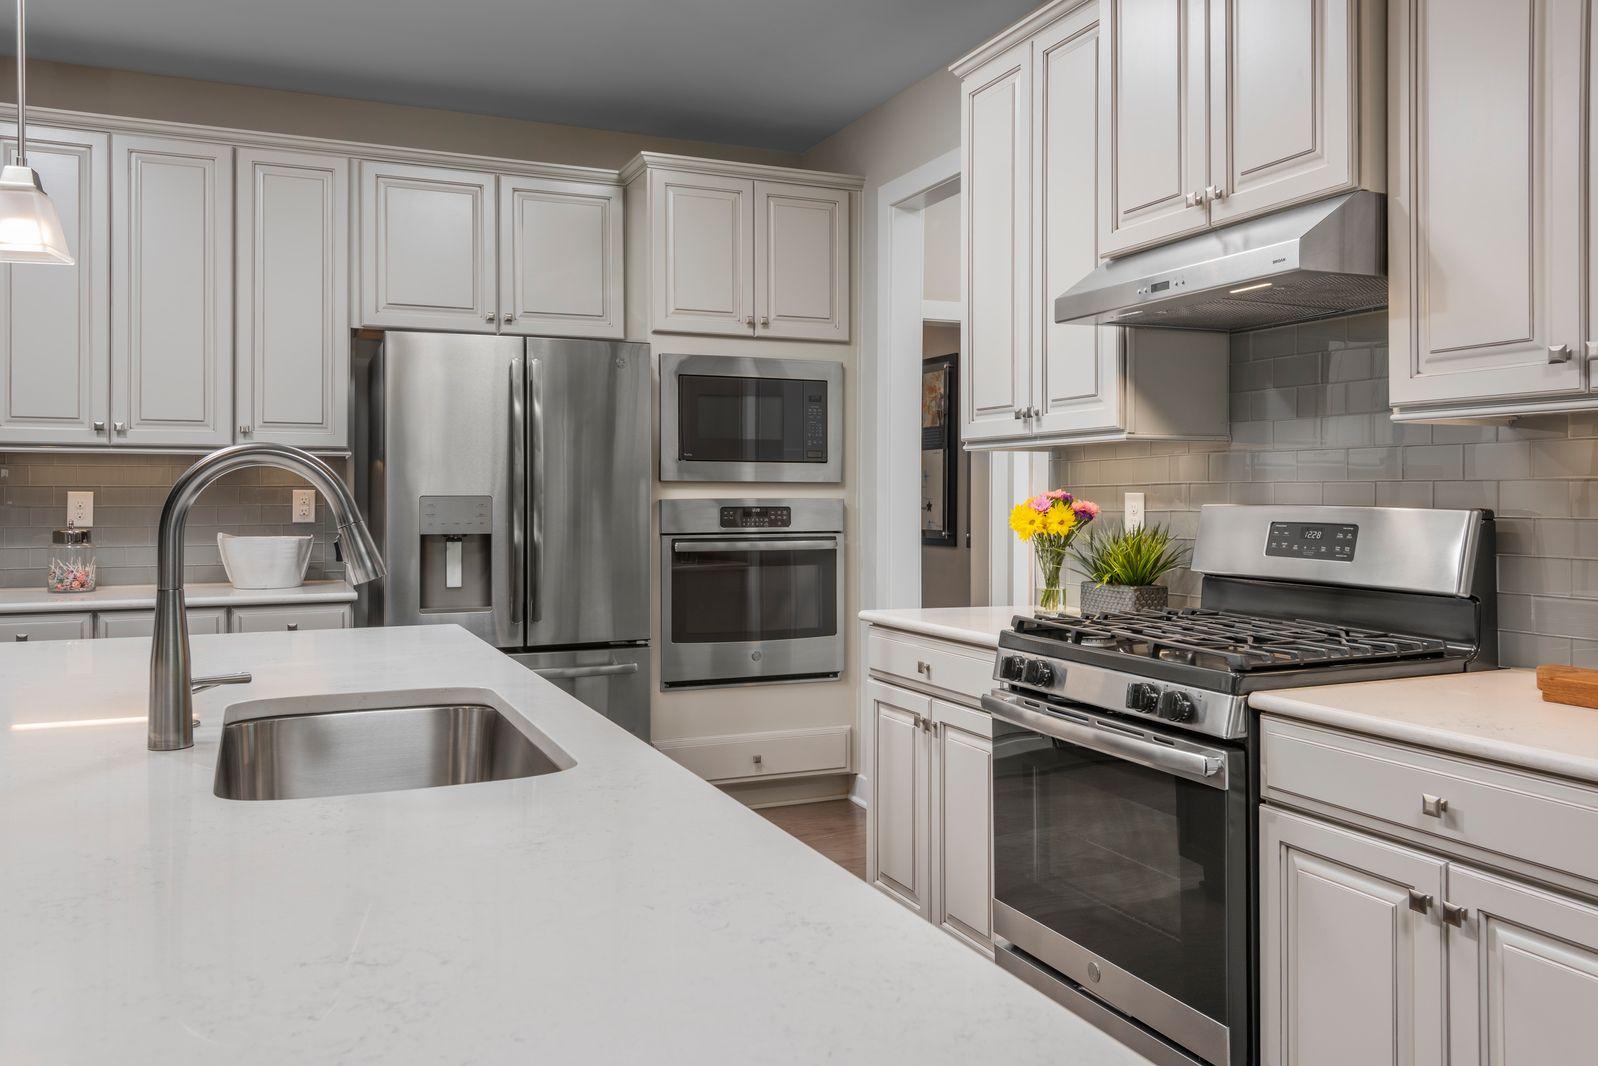 Kitchen featured in the Seneca By Ryan Homes in Washington, VA